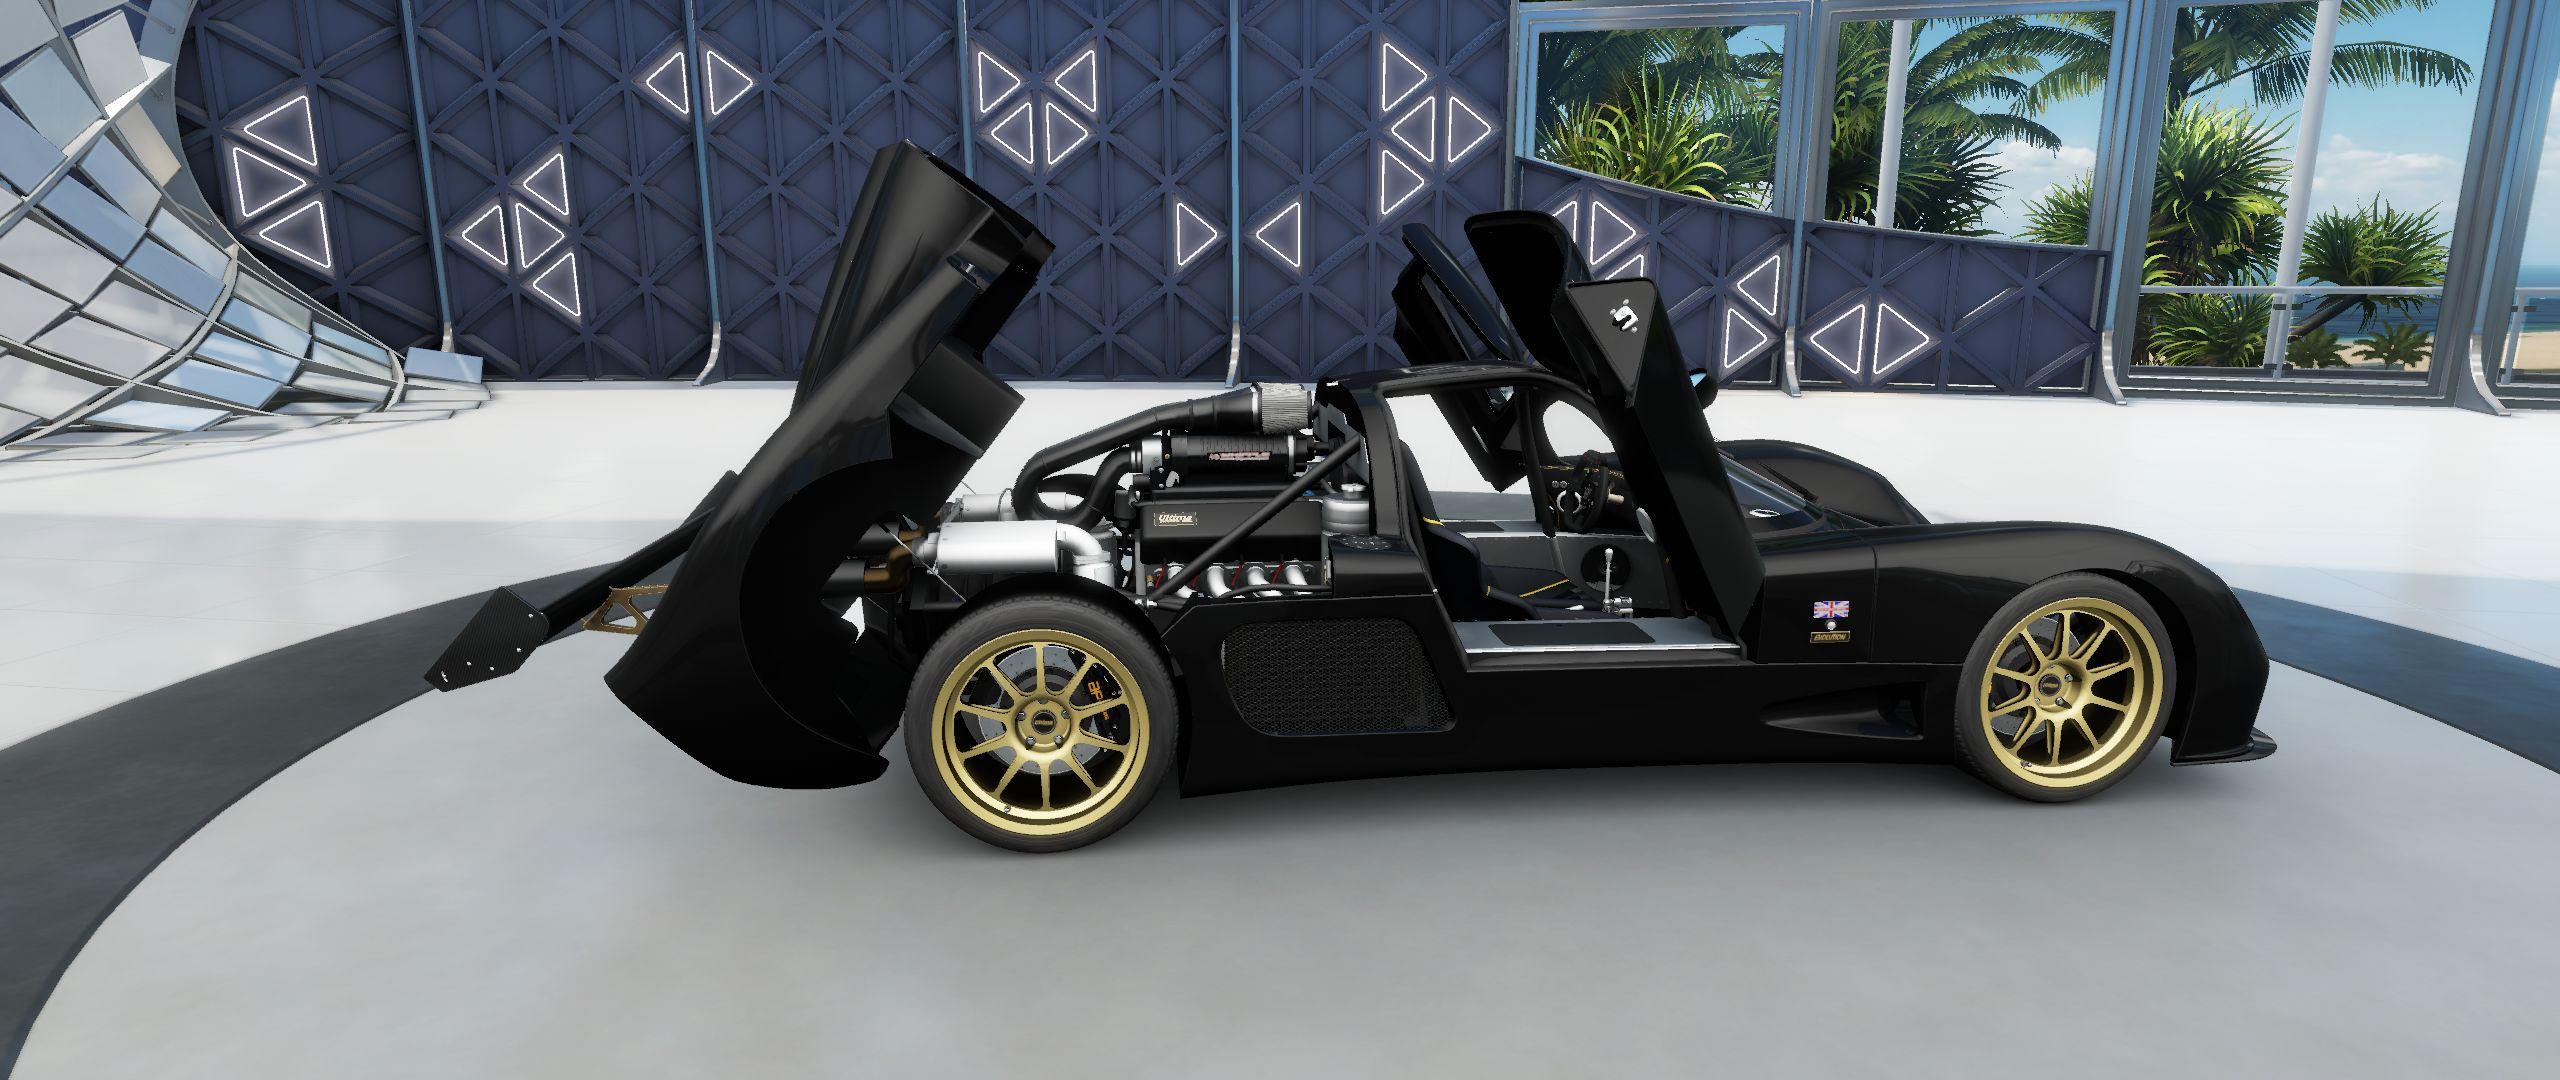 Garage Cars Forza Horizon